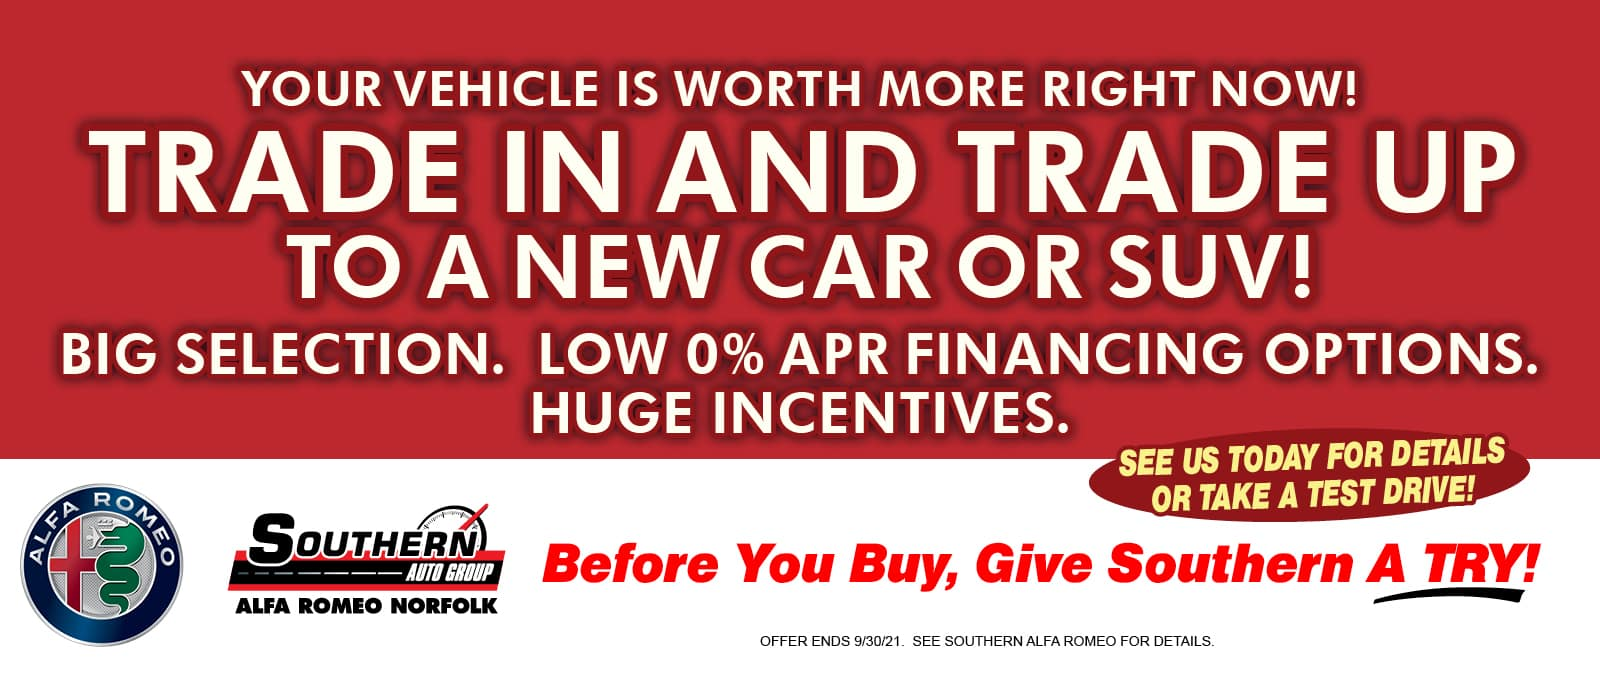 Trade Worth More – Southern Alfa Romeo